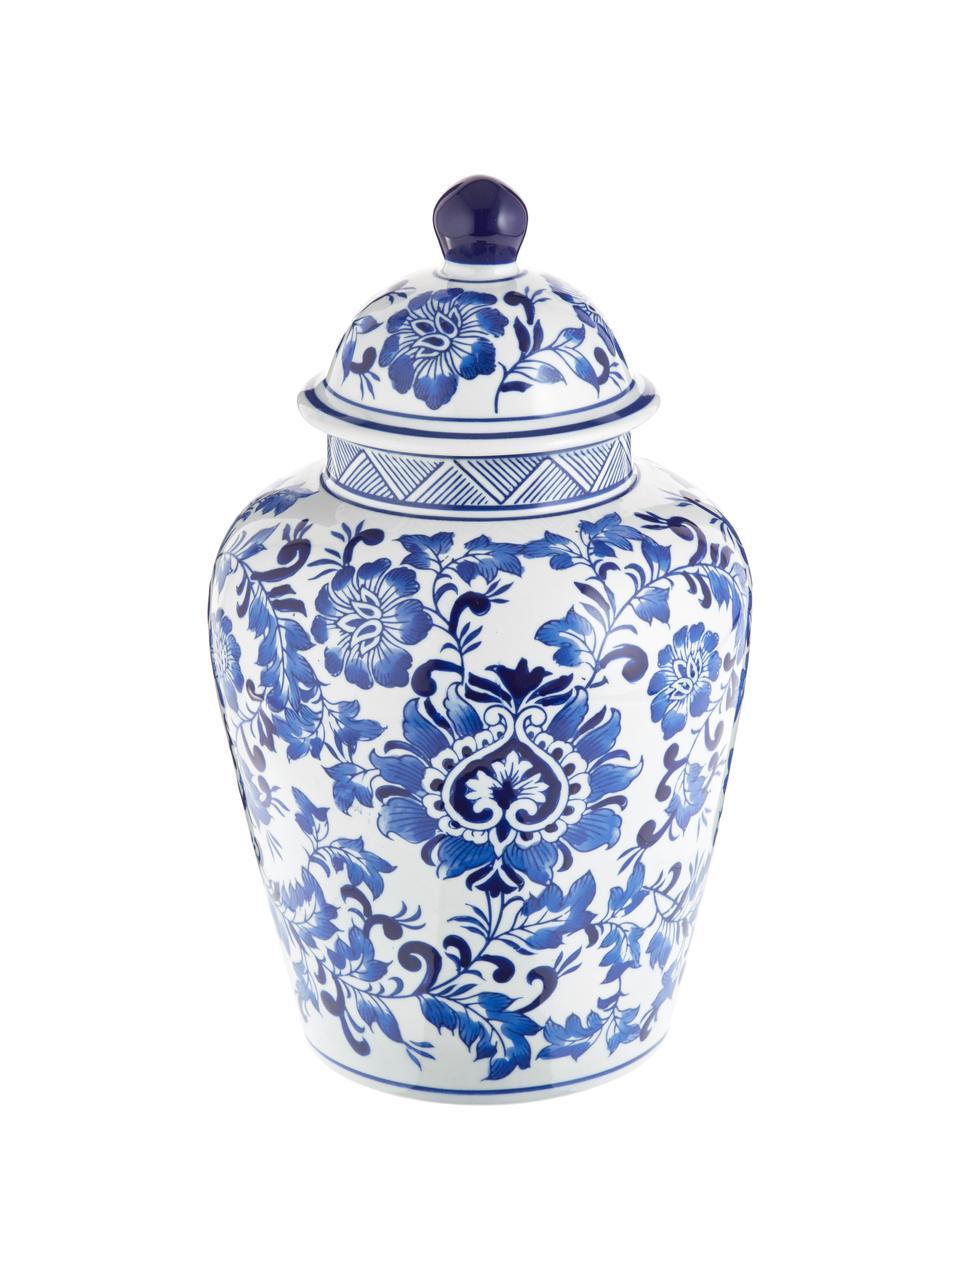 Tibor de porcelana Annabelle, Porcelana, Azul, blanco, Ø 20 cm